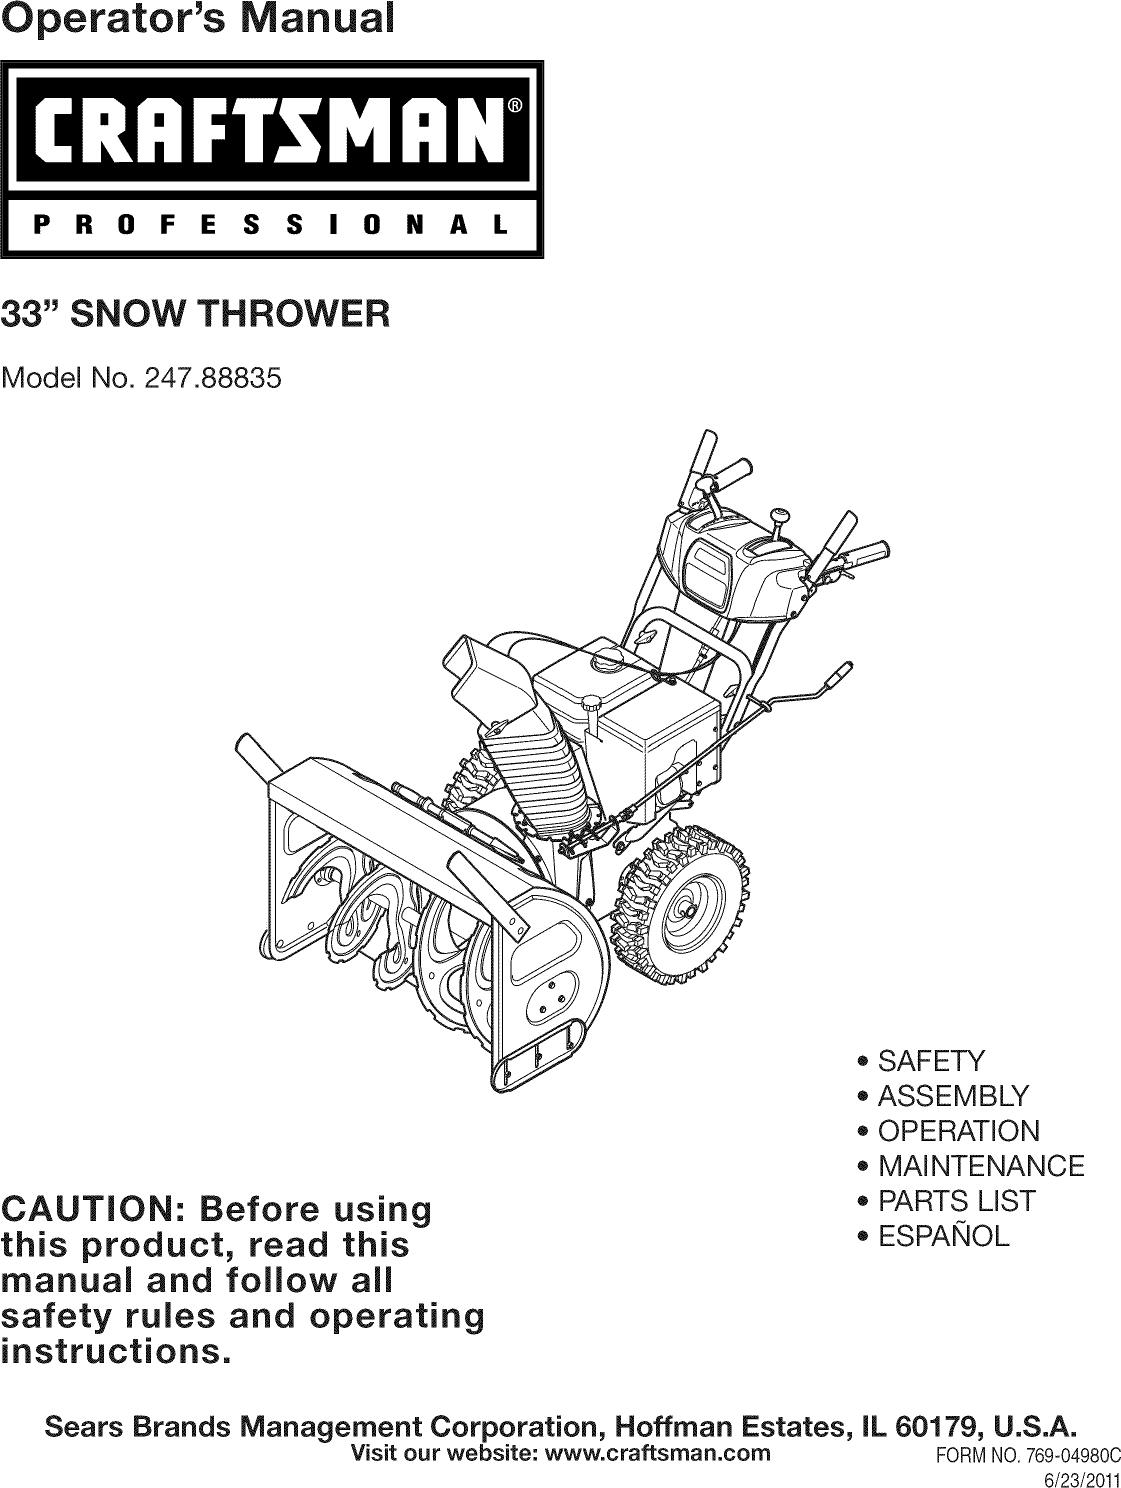 Operator u0026apos s manualp r 0 f e s s i 0 n a l33 u0026quot snow throwermodel no 247 88835